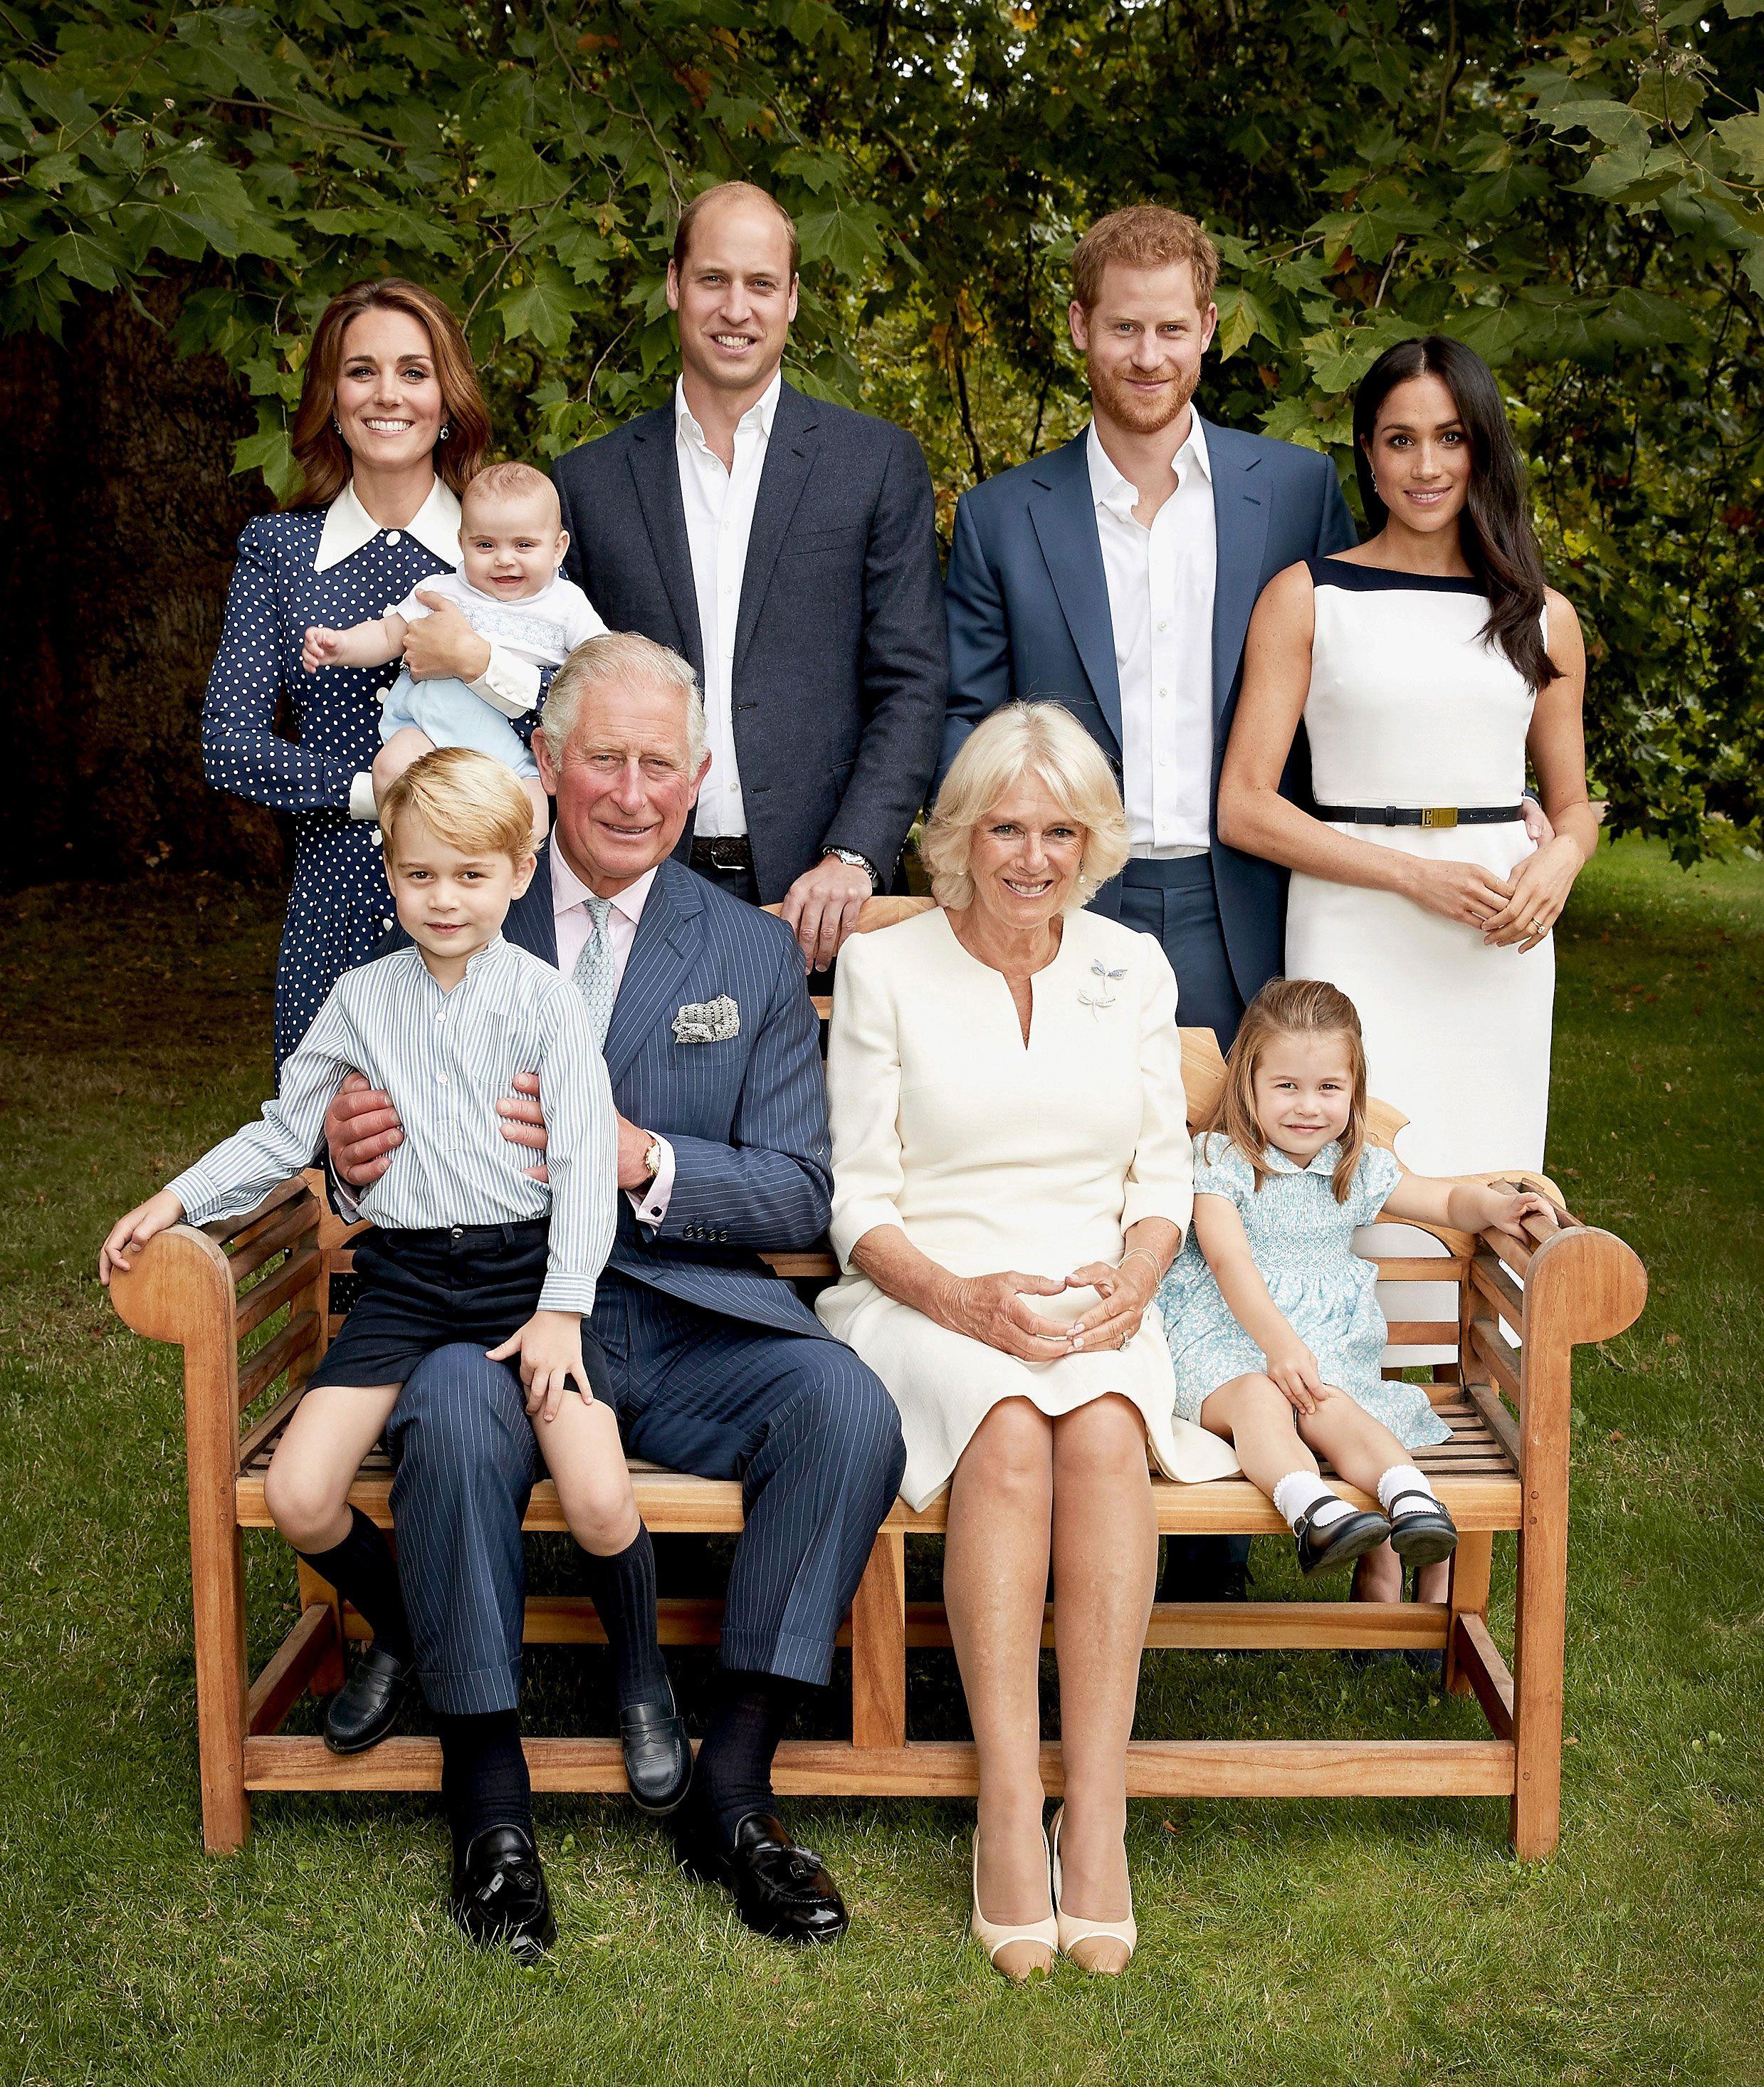 prince charles 70th birthday royal portrait